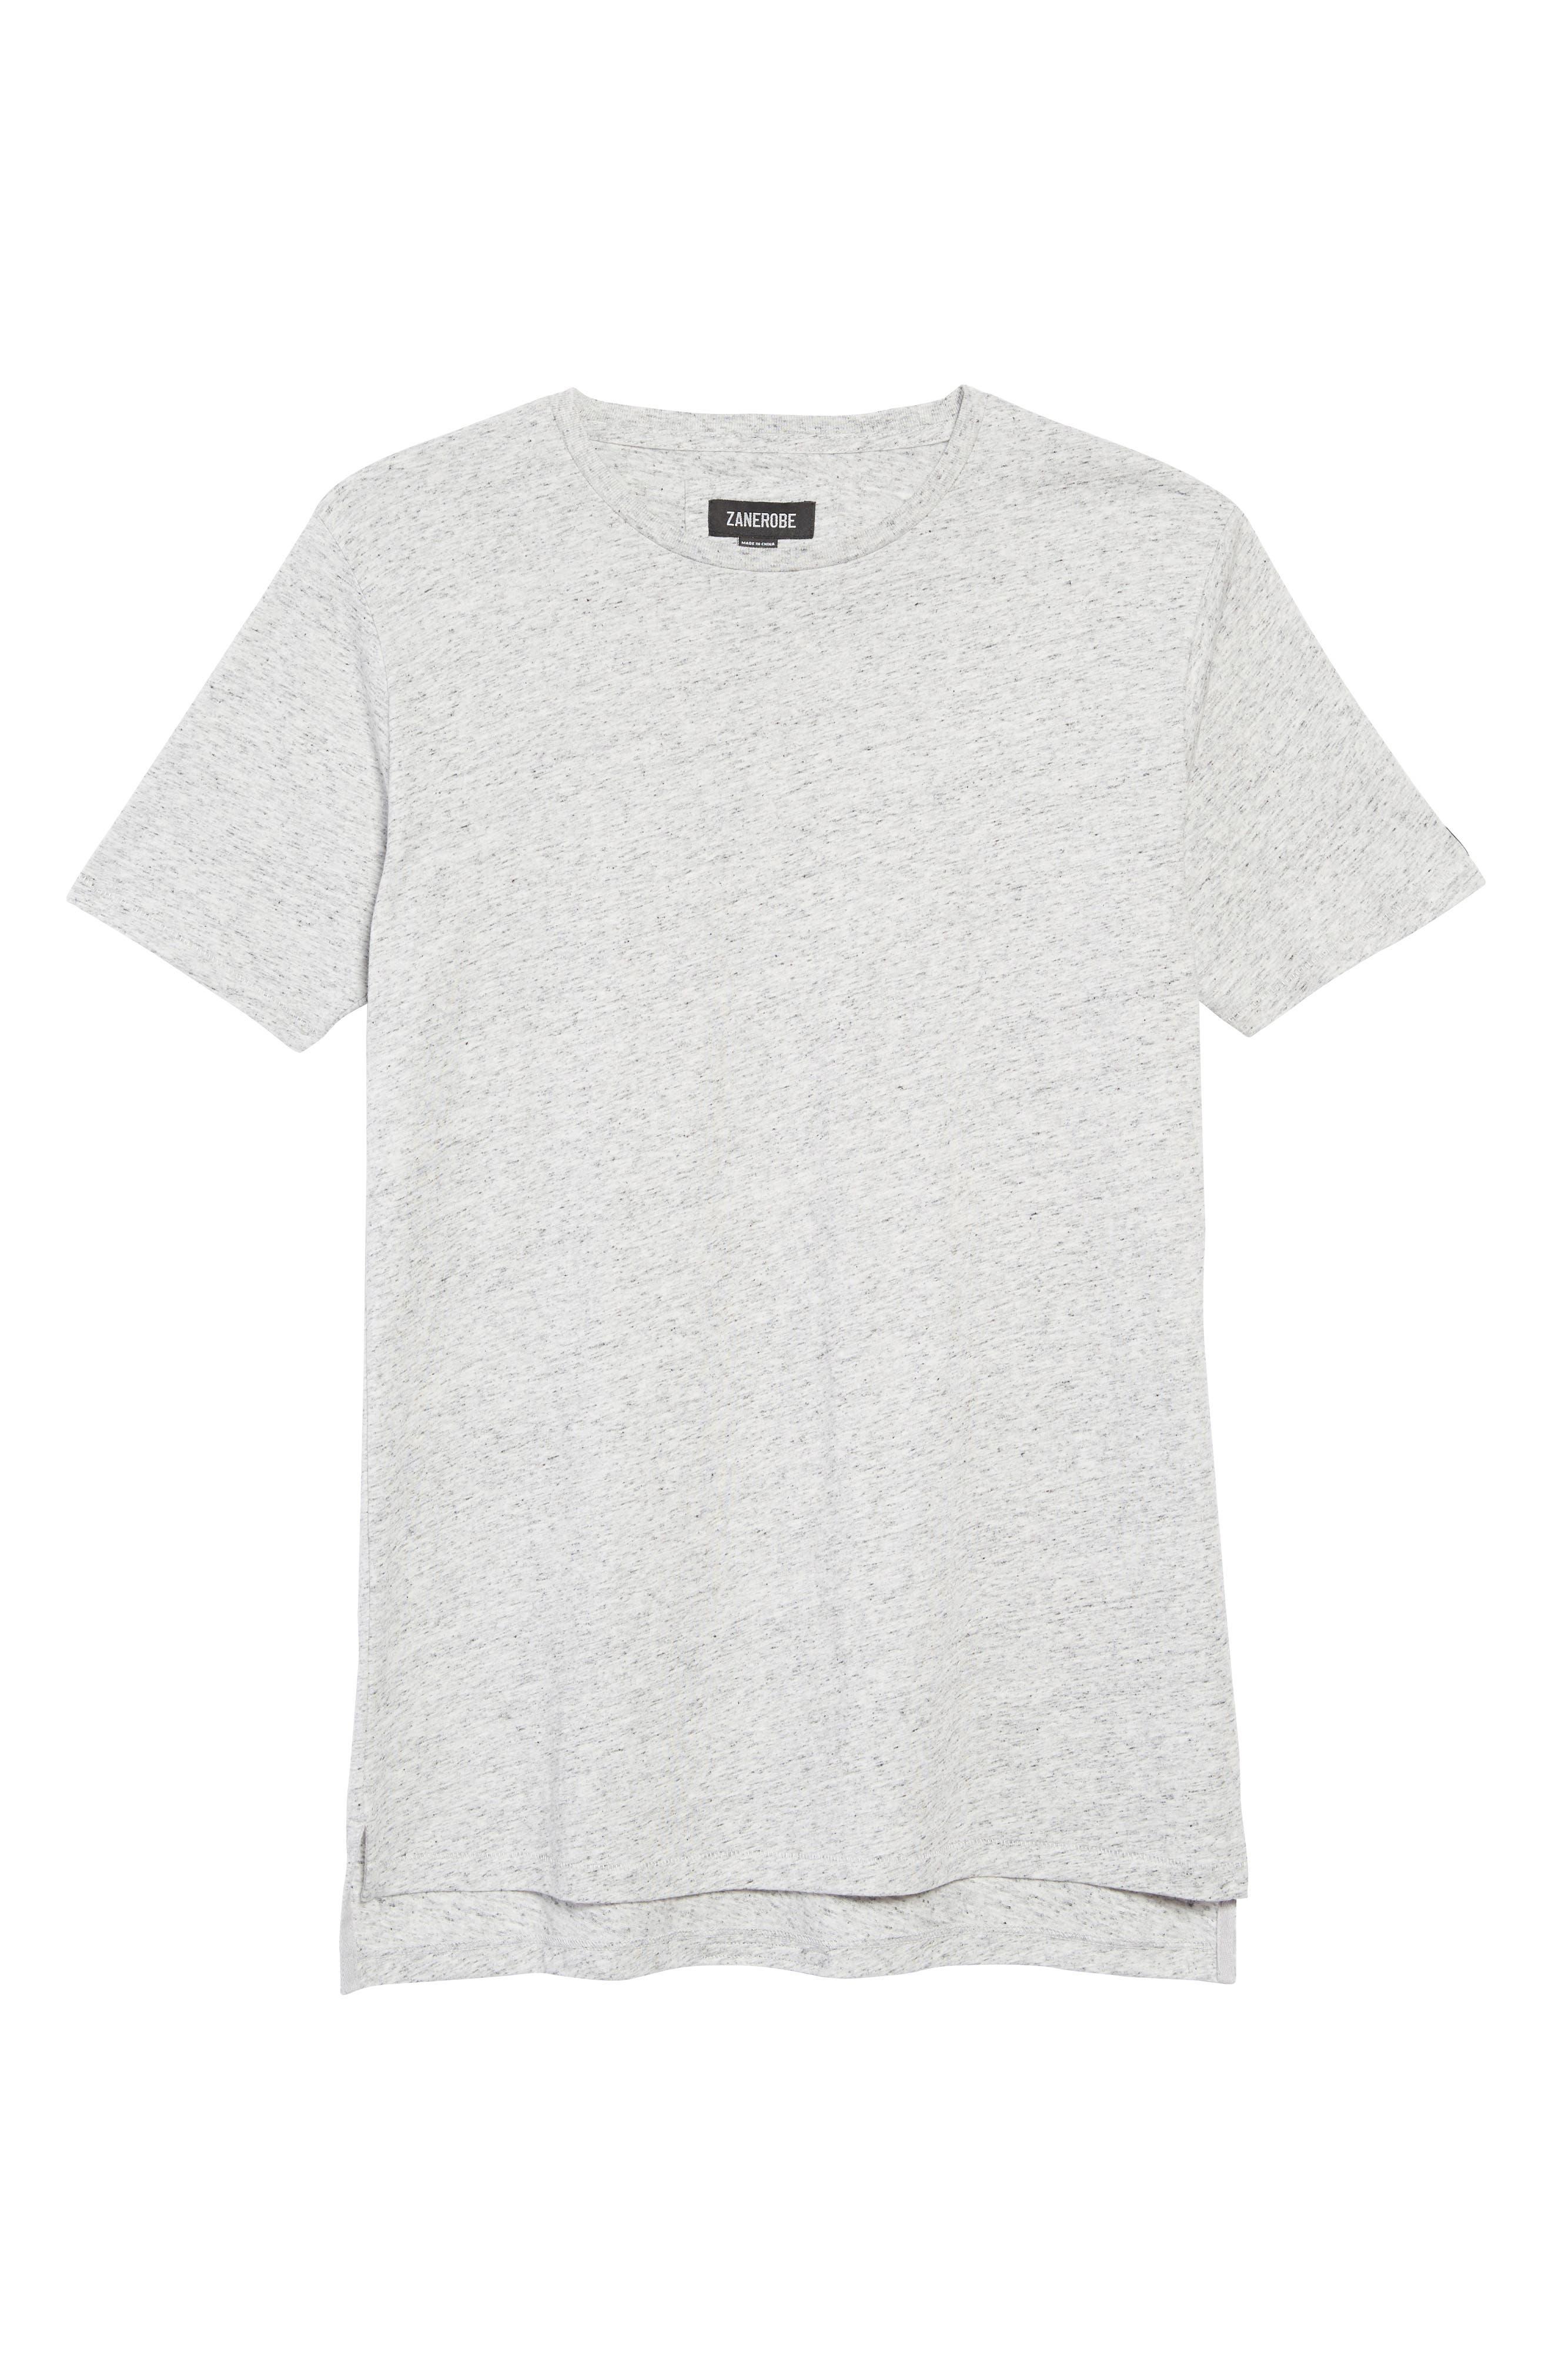 Flintlock T-Shirt,                             Alternate thumbnail 4, color,                             060